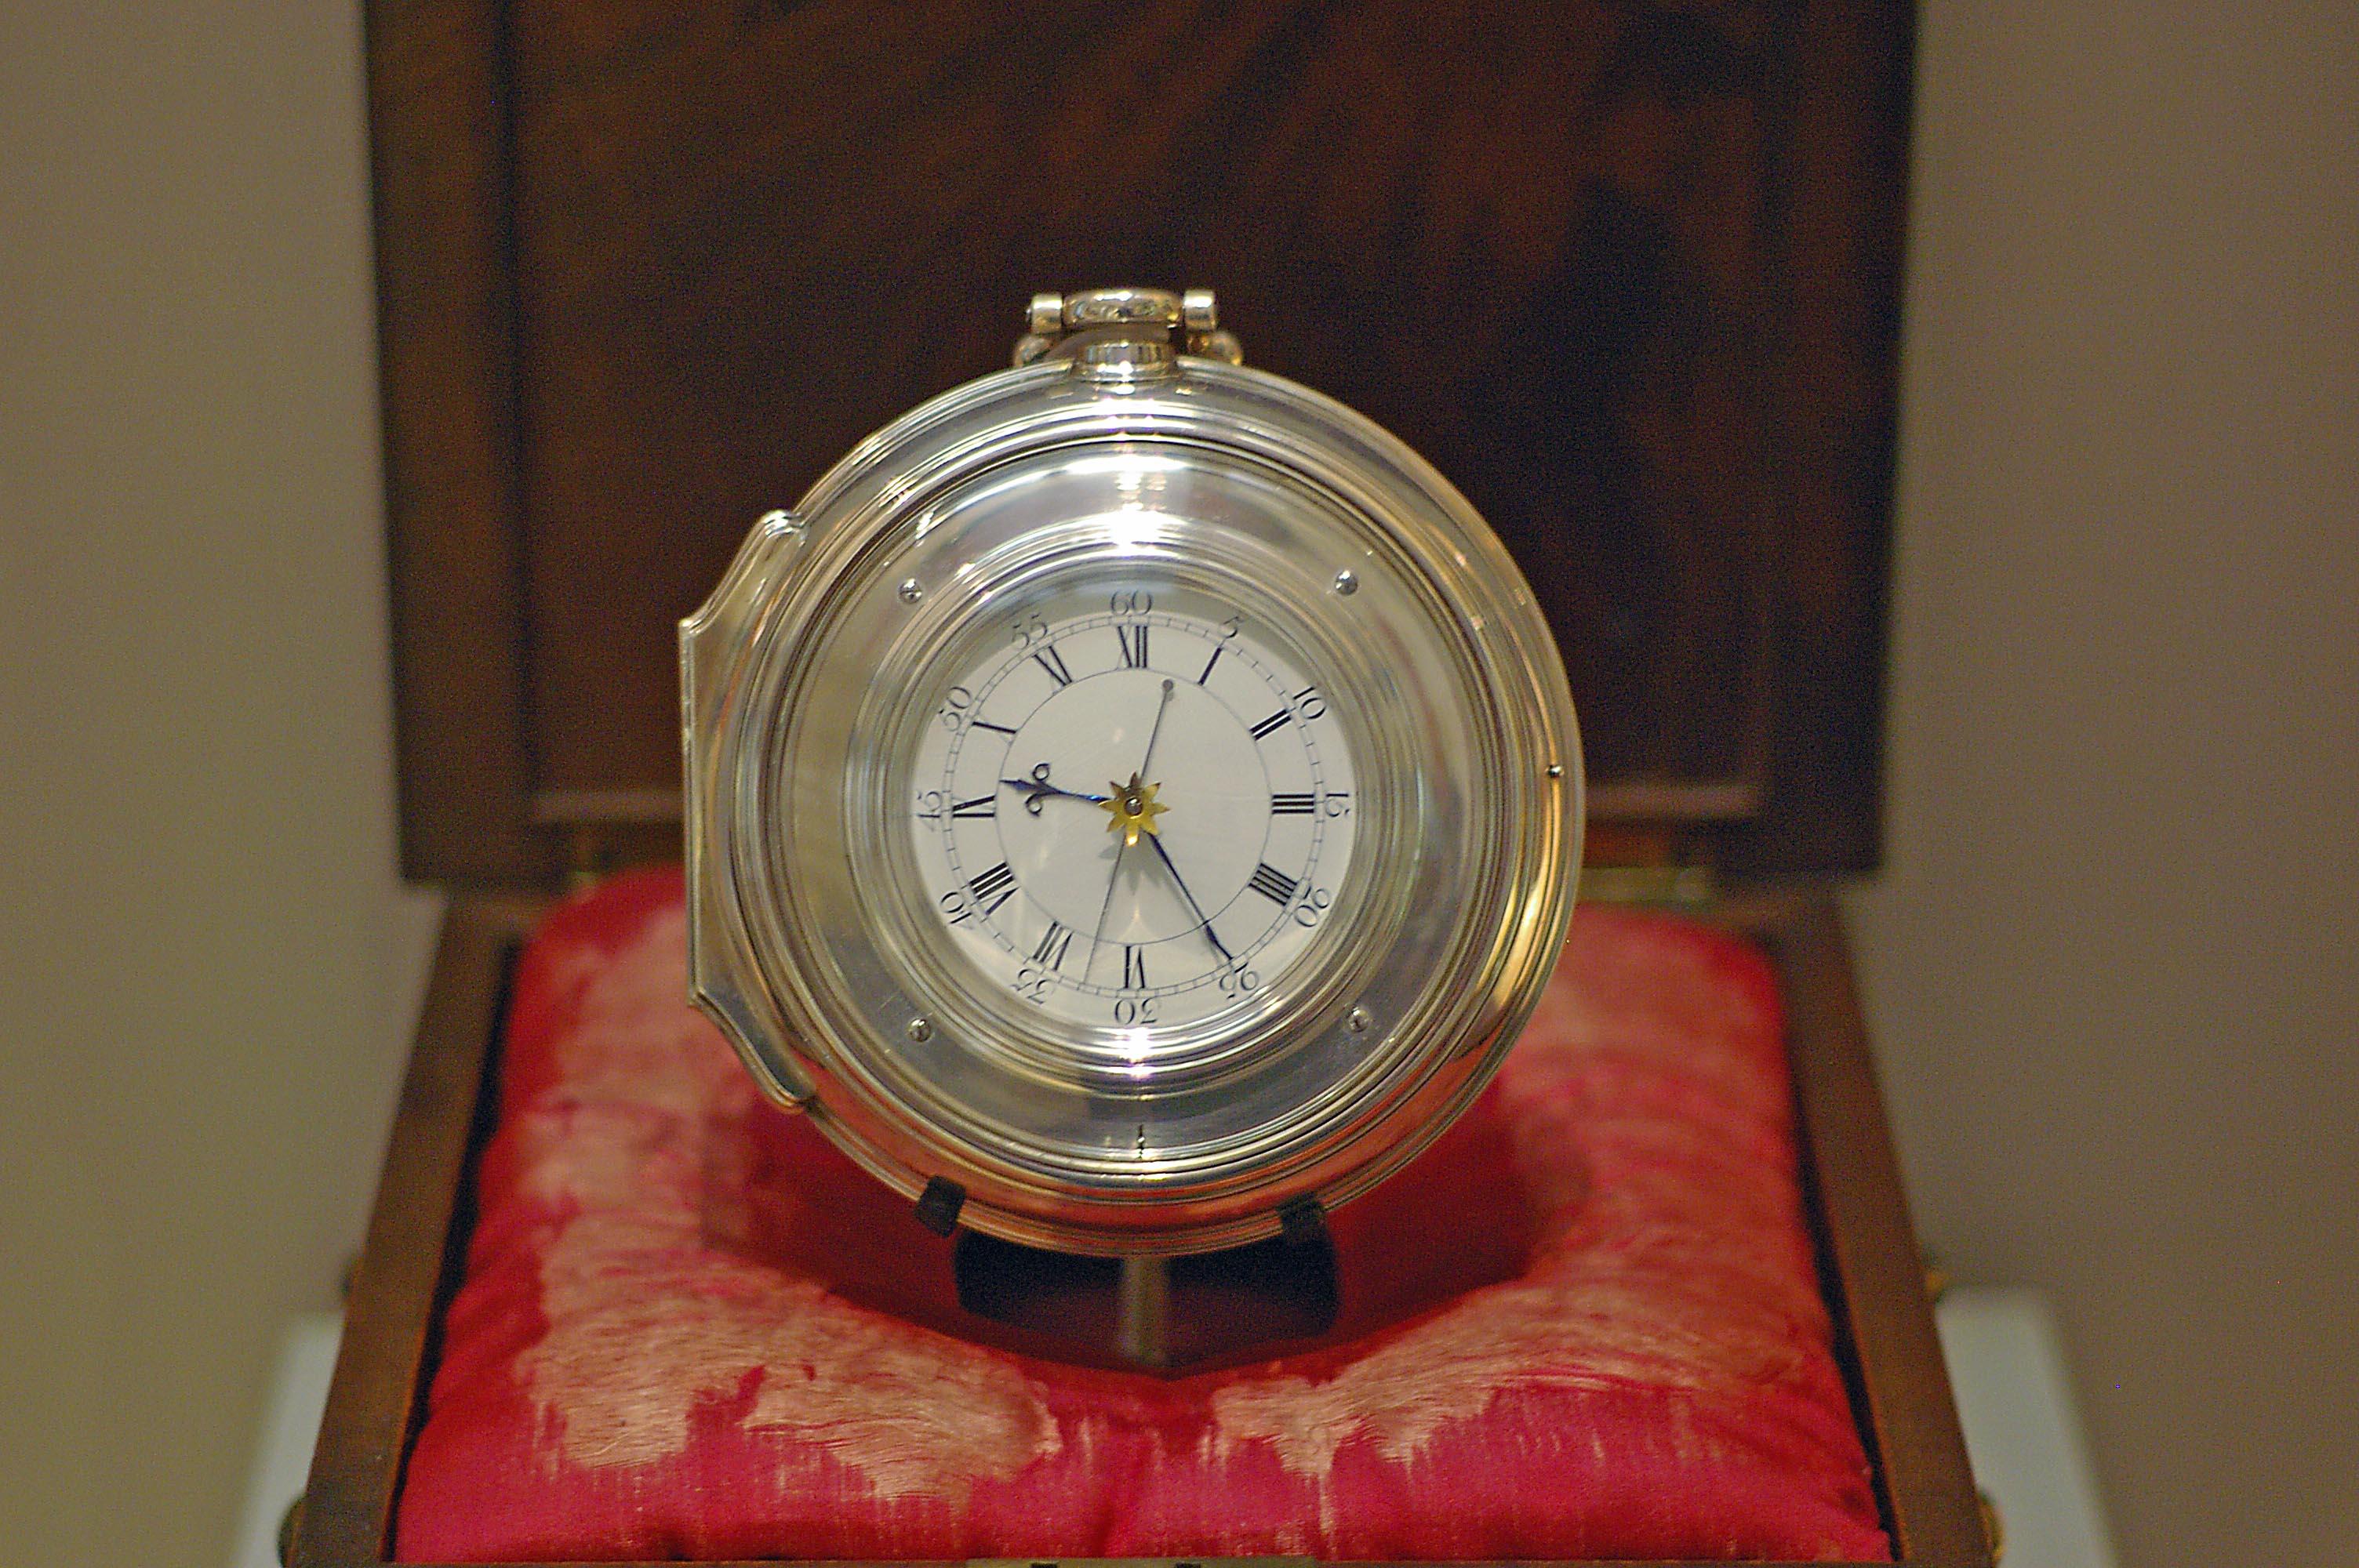 H5, el cronómetro de John Harrison